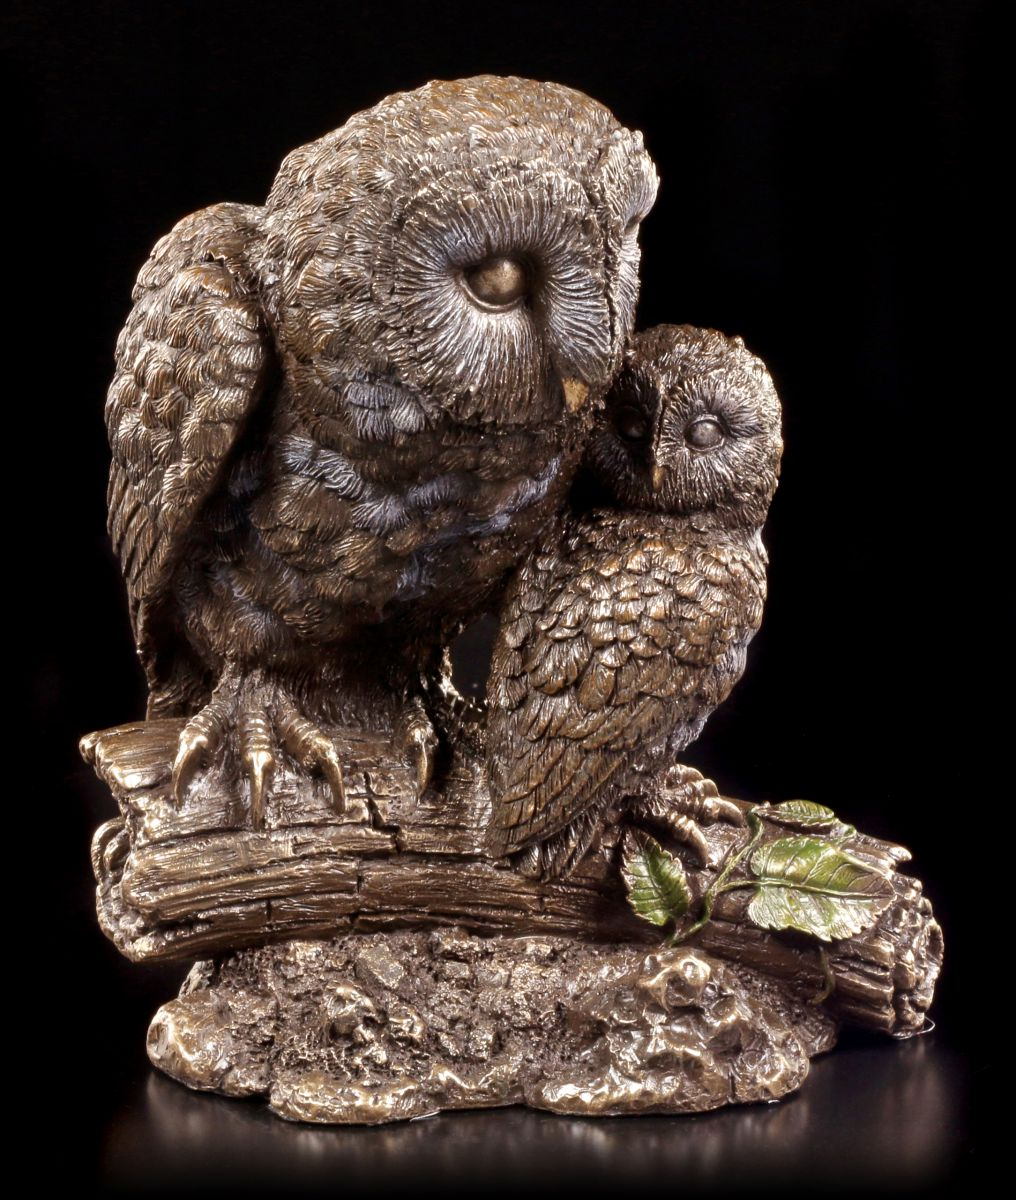 eulen figur mutter kind bronze optik statue deko veronese ebay. Black Bedroom Furniture Sets. Home Design Ideas